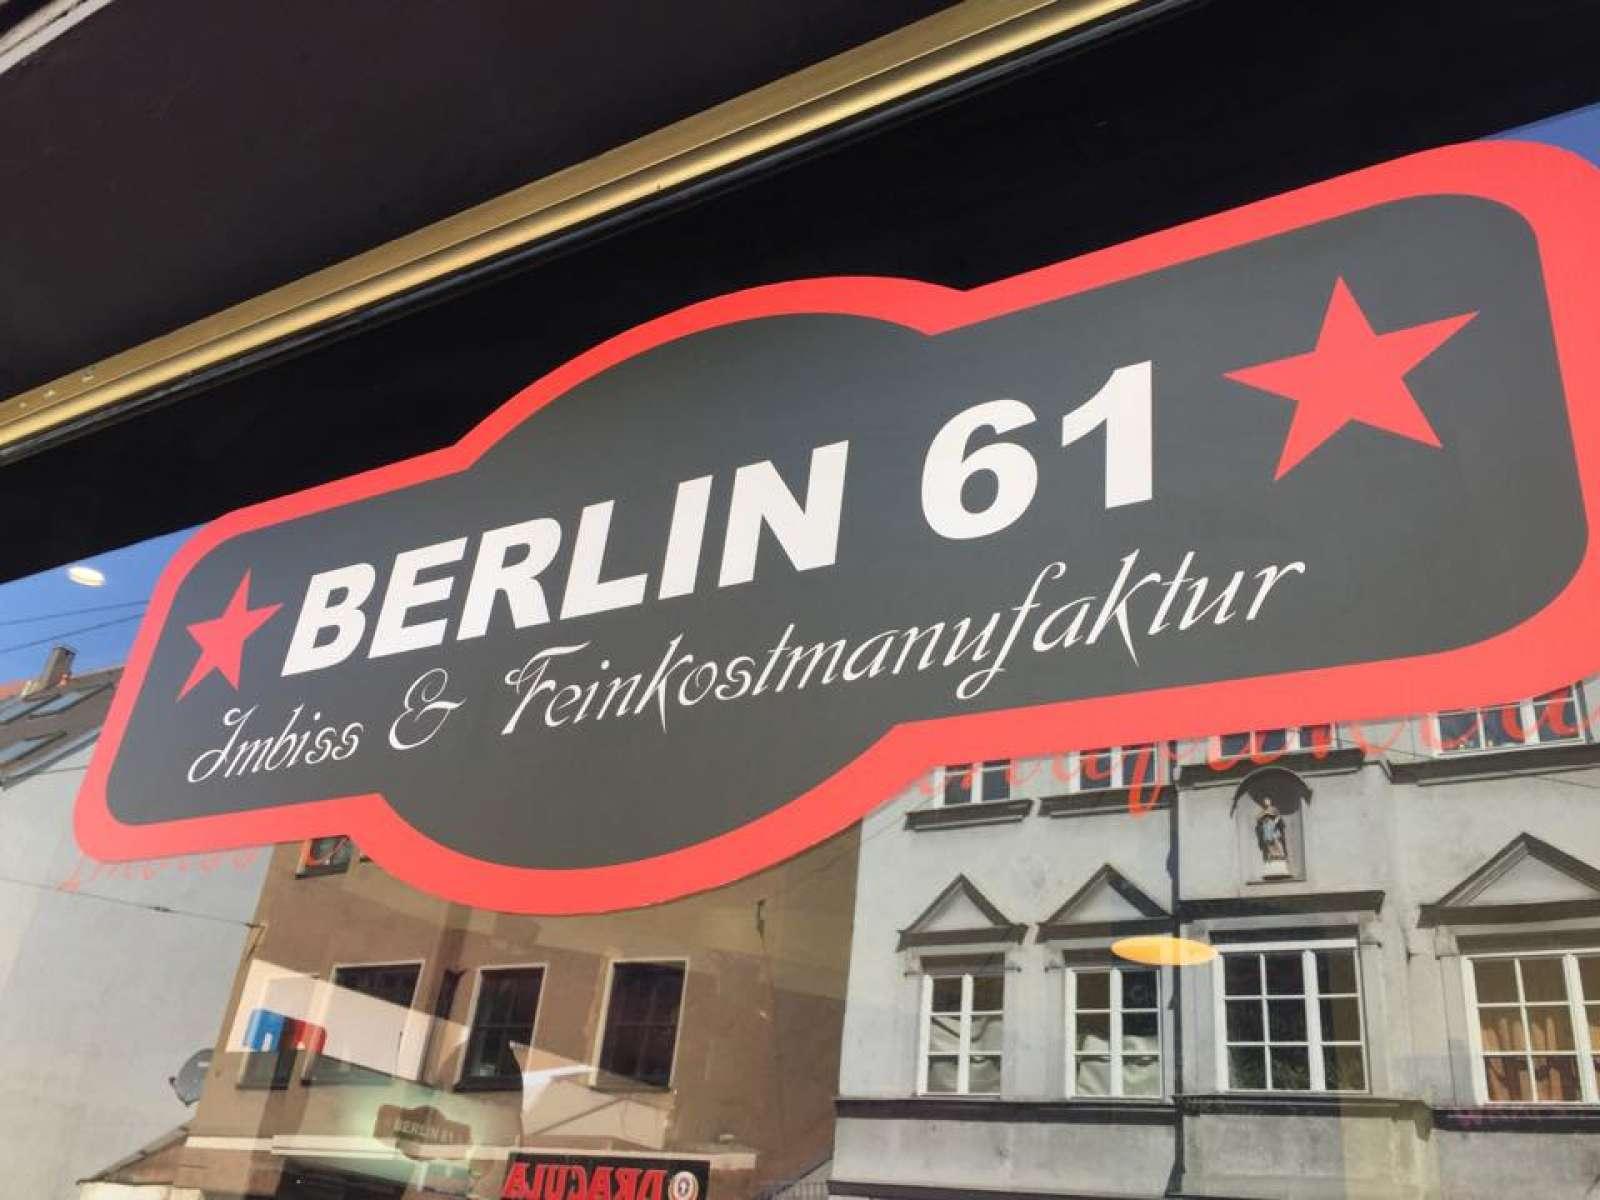 Berlin 61